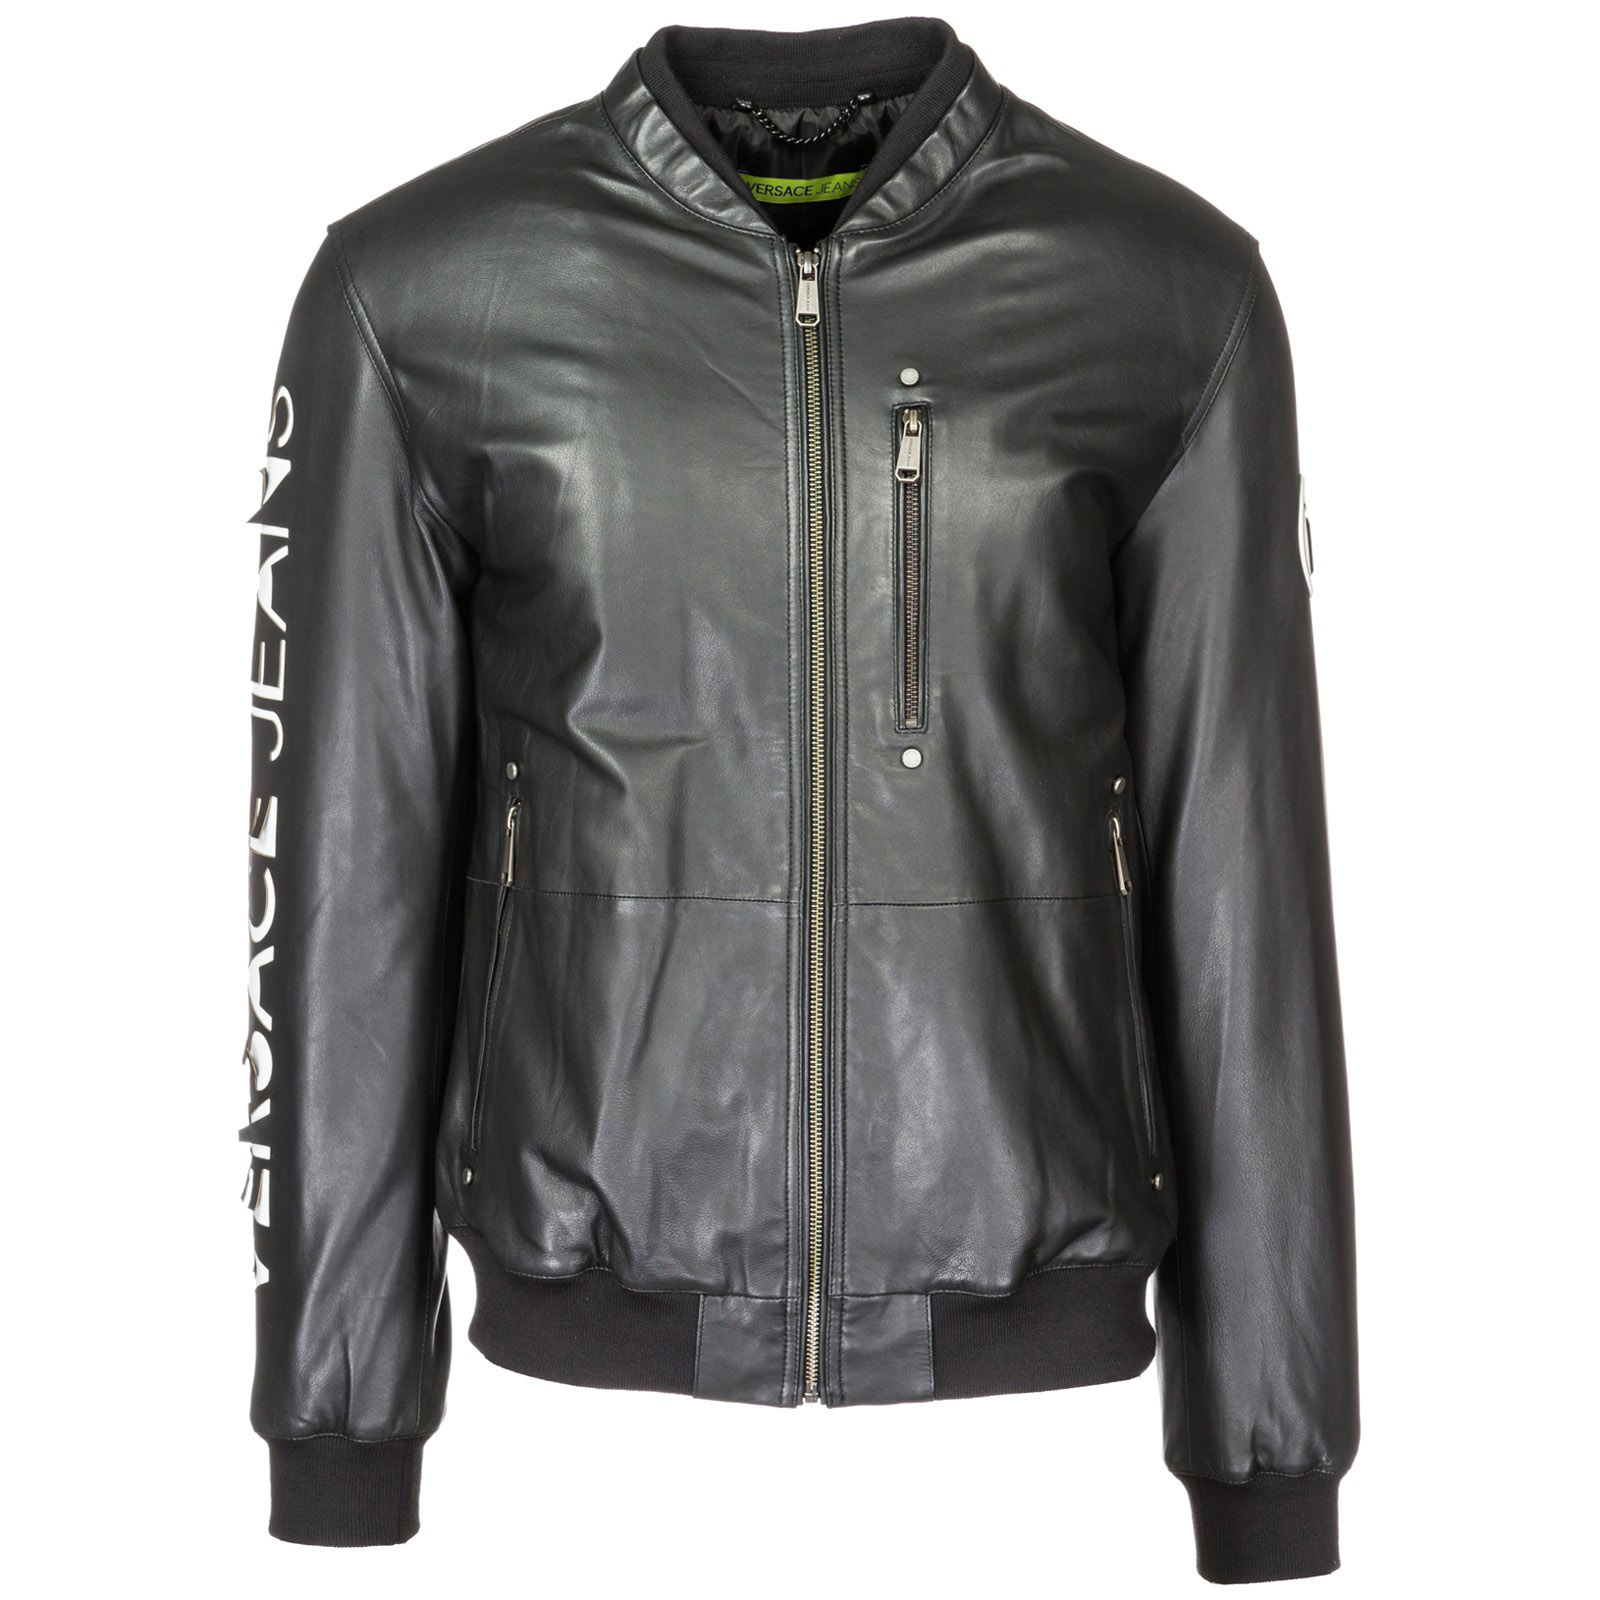 d44f63a53b1c Veste en cuir Versace Jeans ECGSA9P0 nero   FRMODA.com